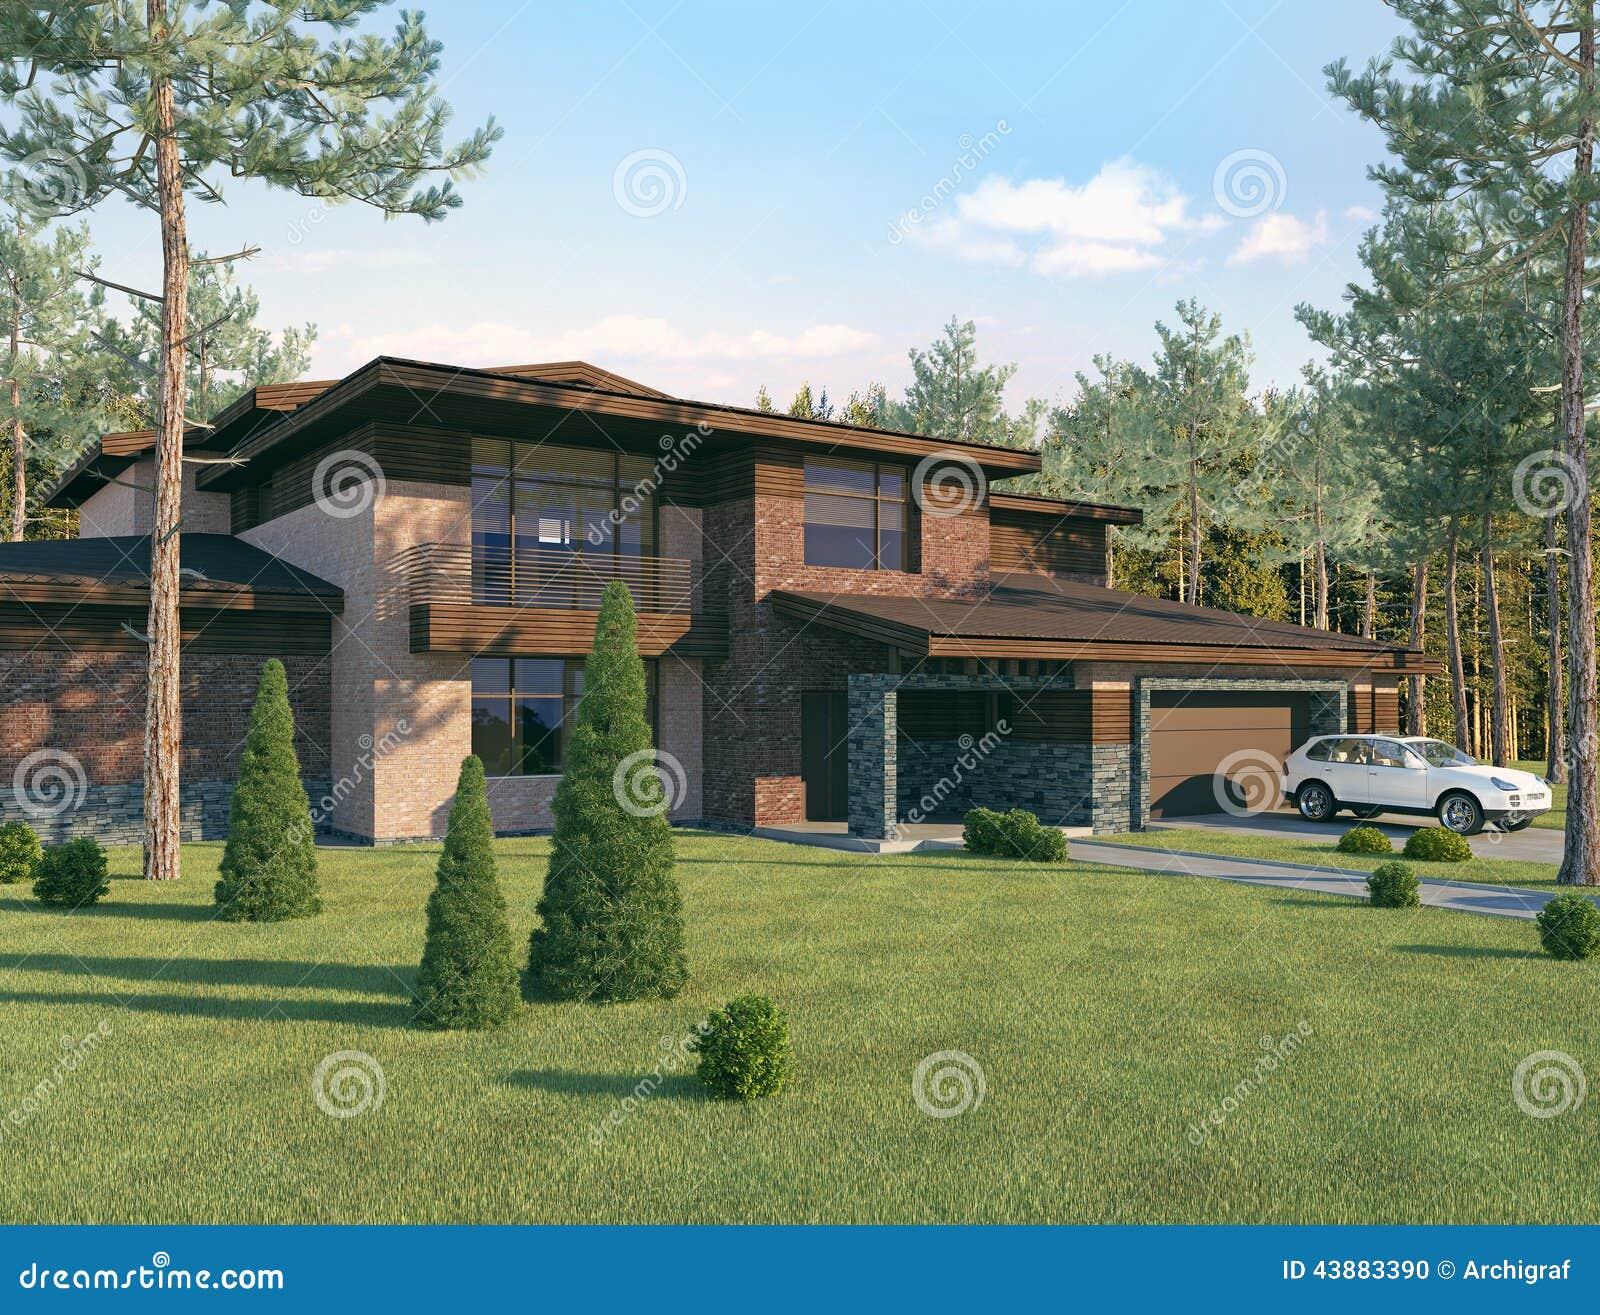 La casa ideal foto de archivo imagen de backyard casa 43883390 - La casa ideal ...